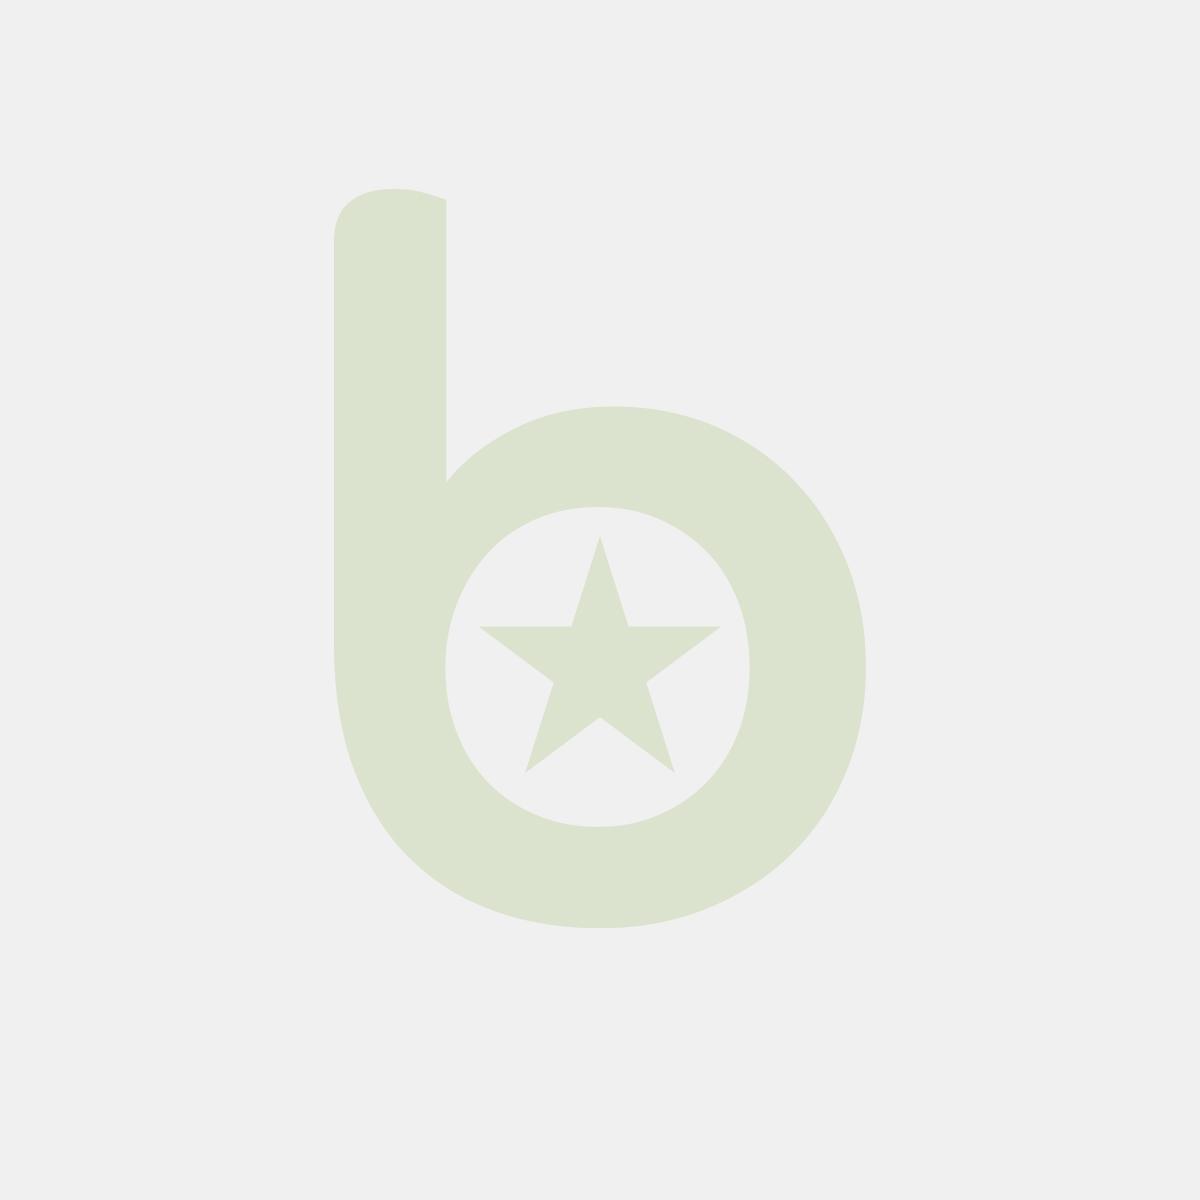 Łyżka kuchenna - kod 563304